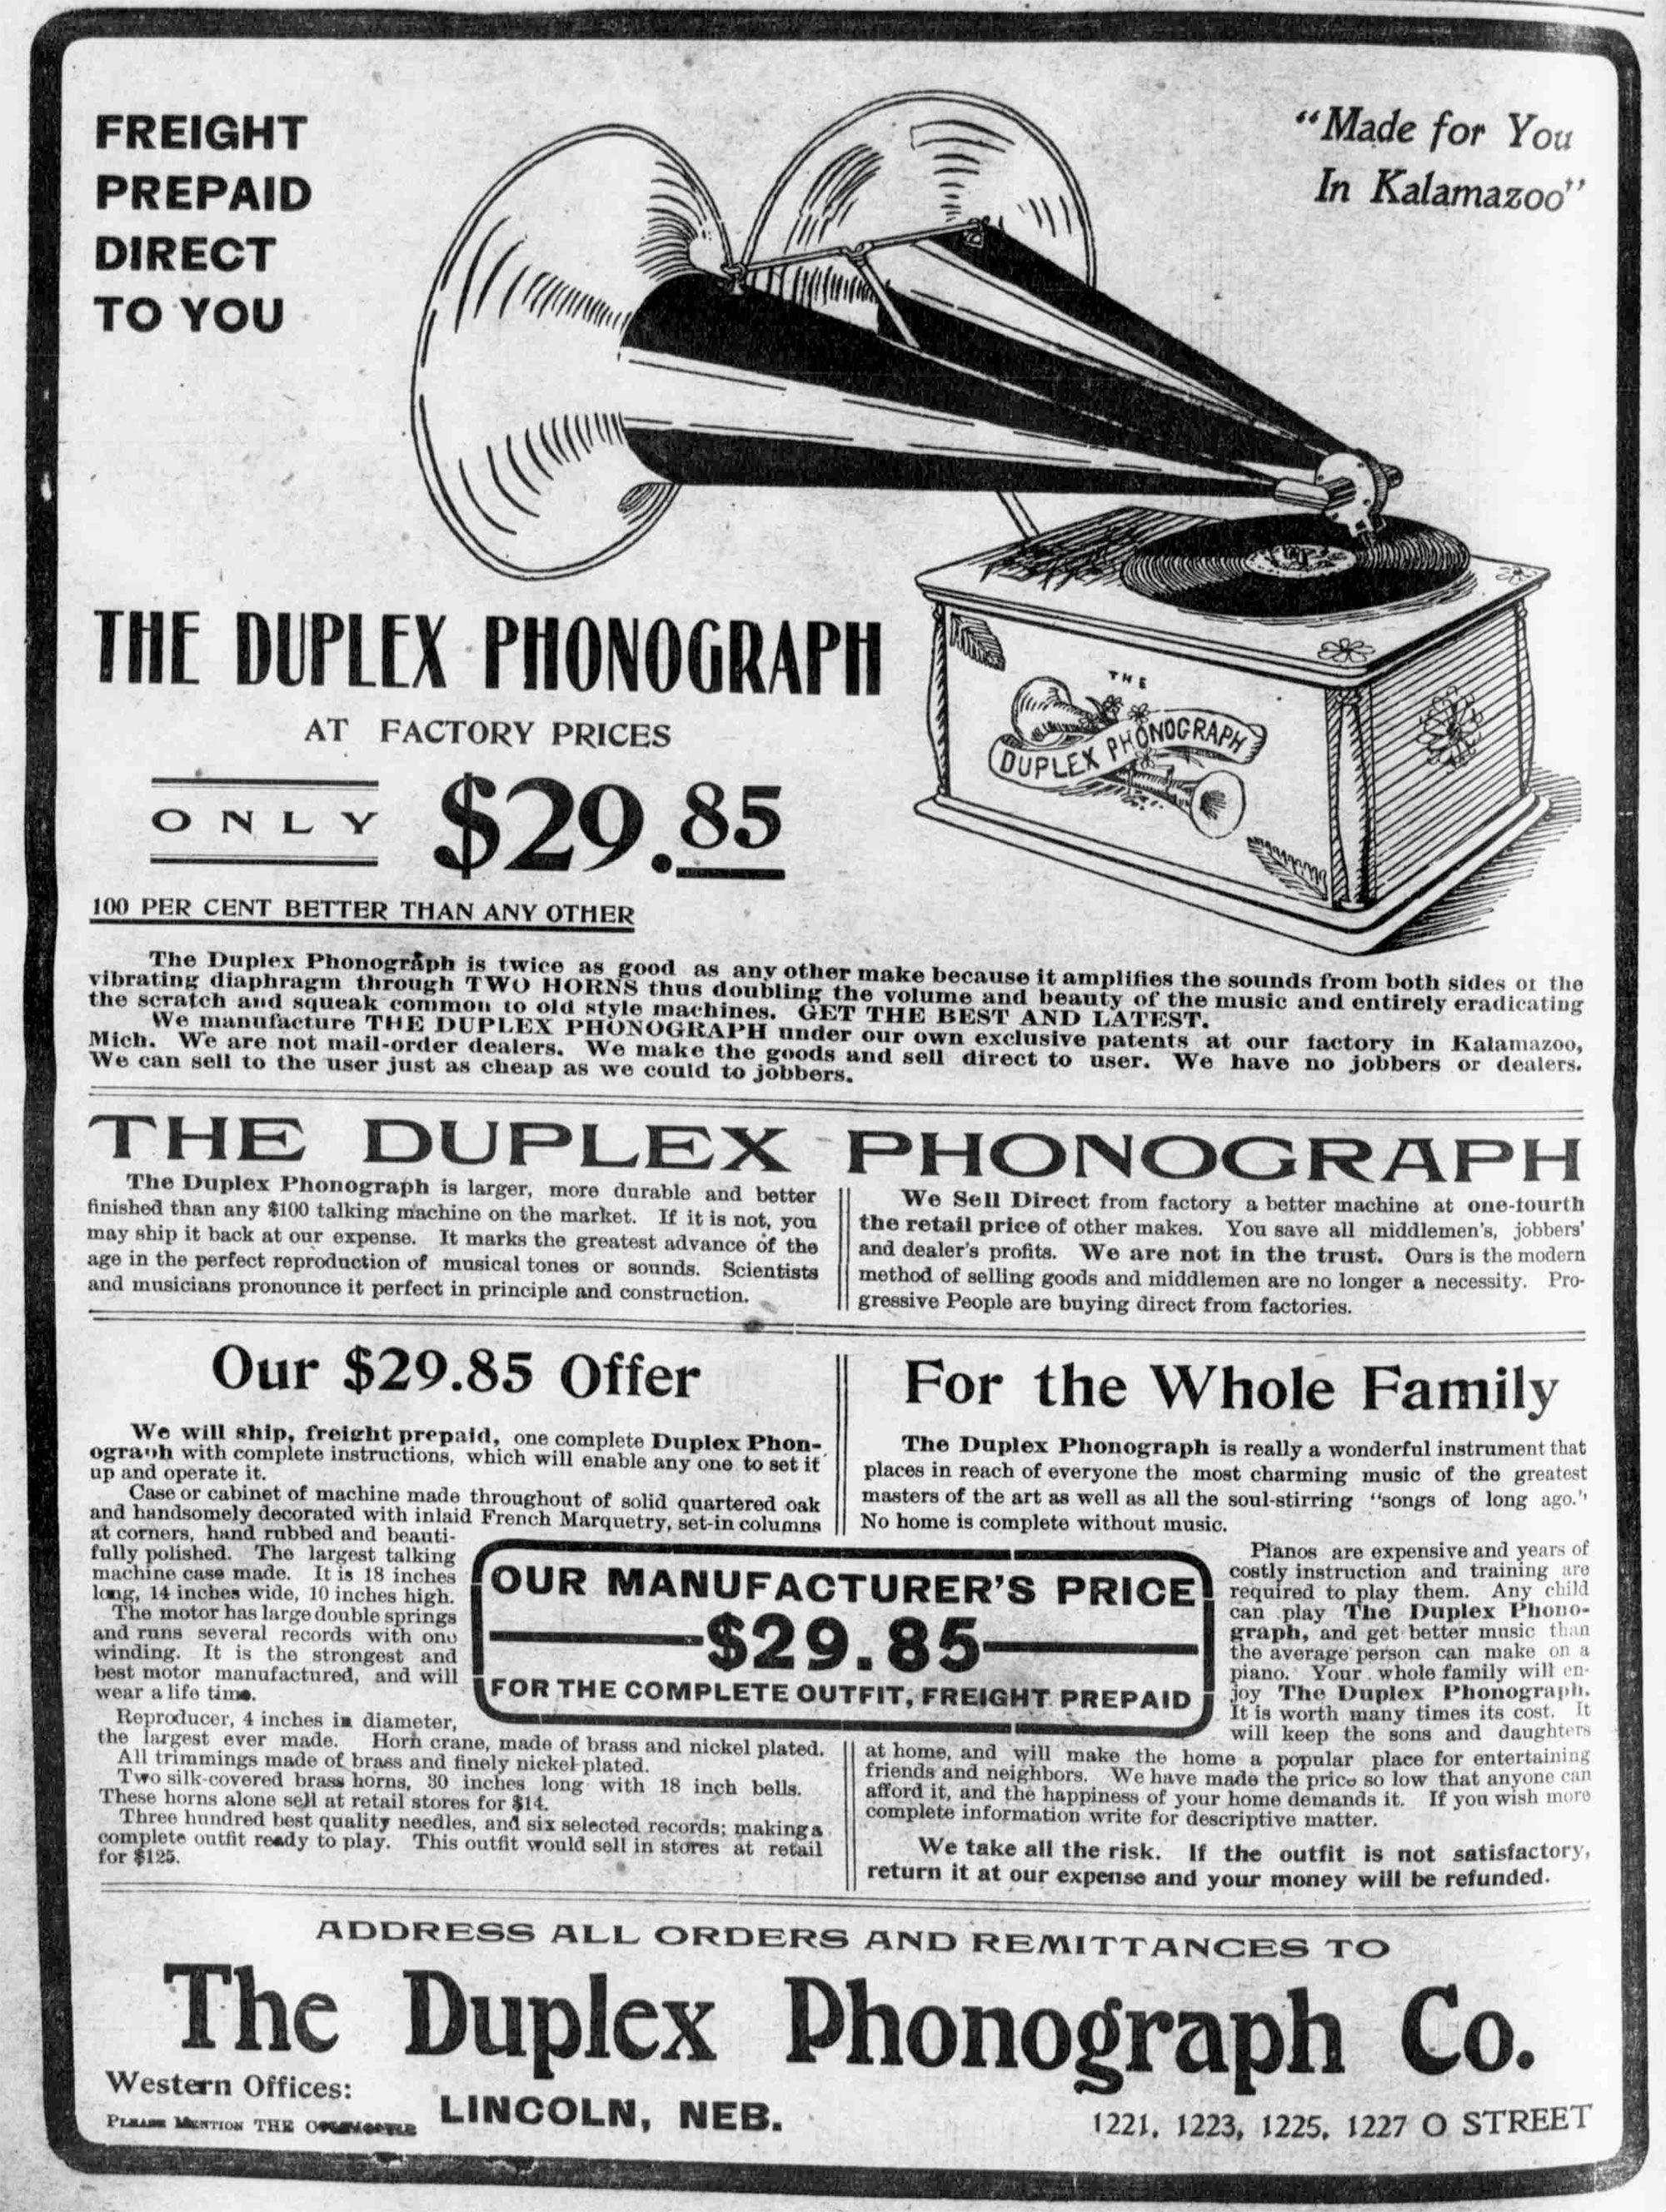 Kalamazoo duplex Phonograph